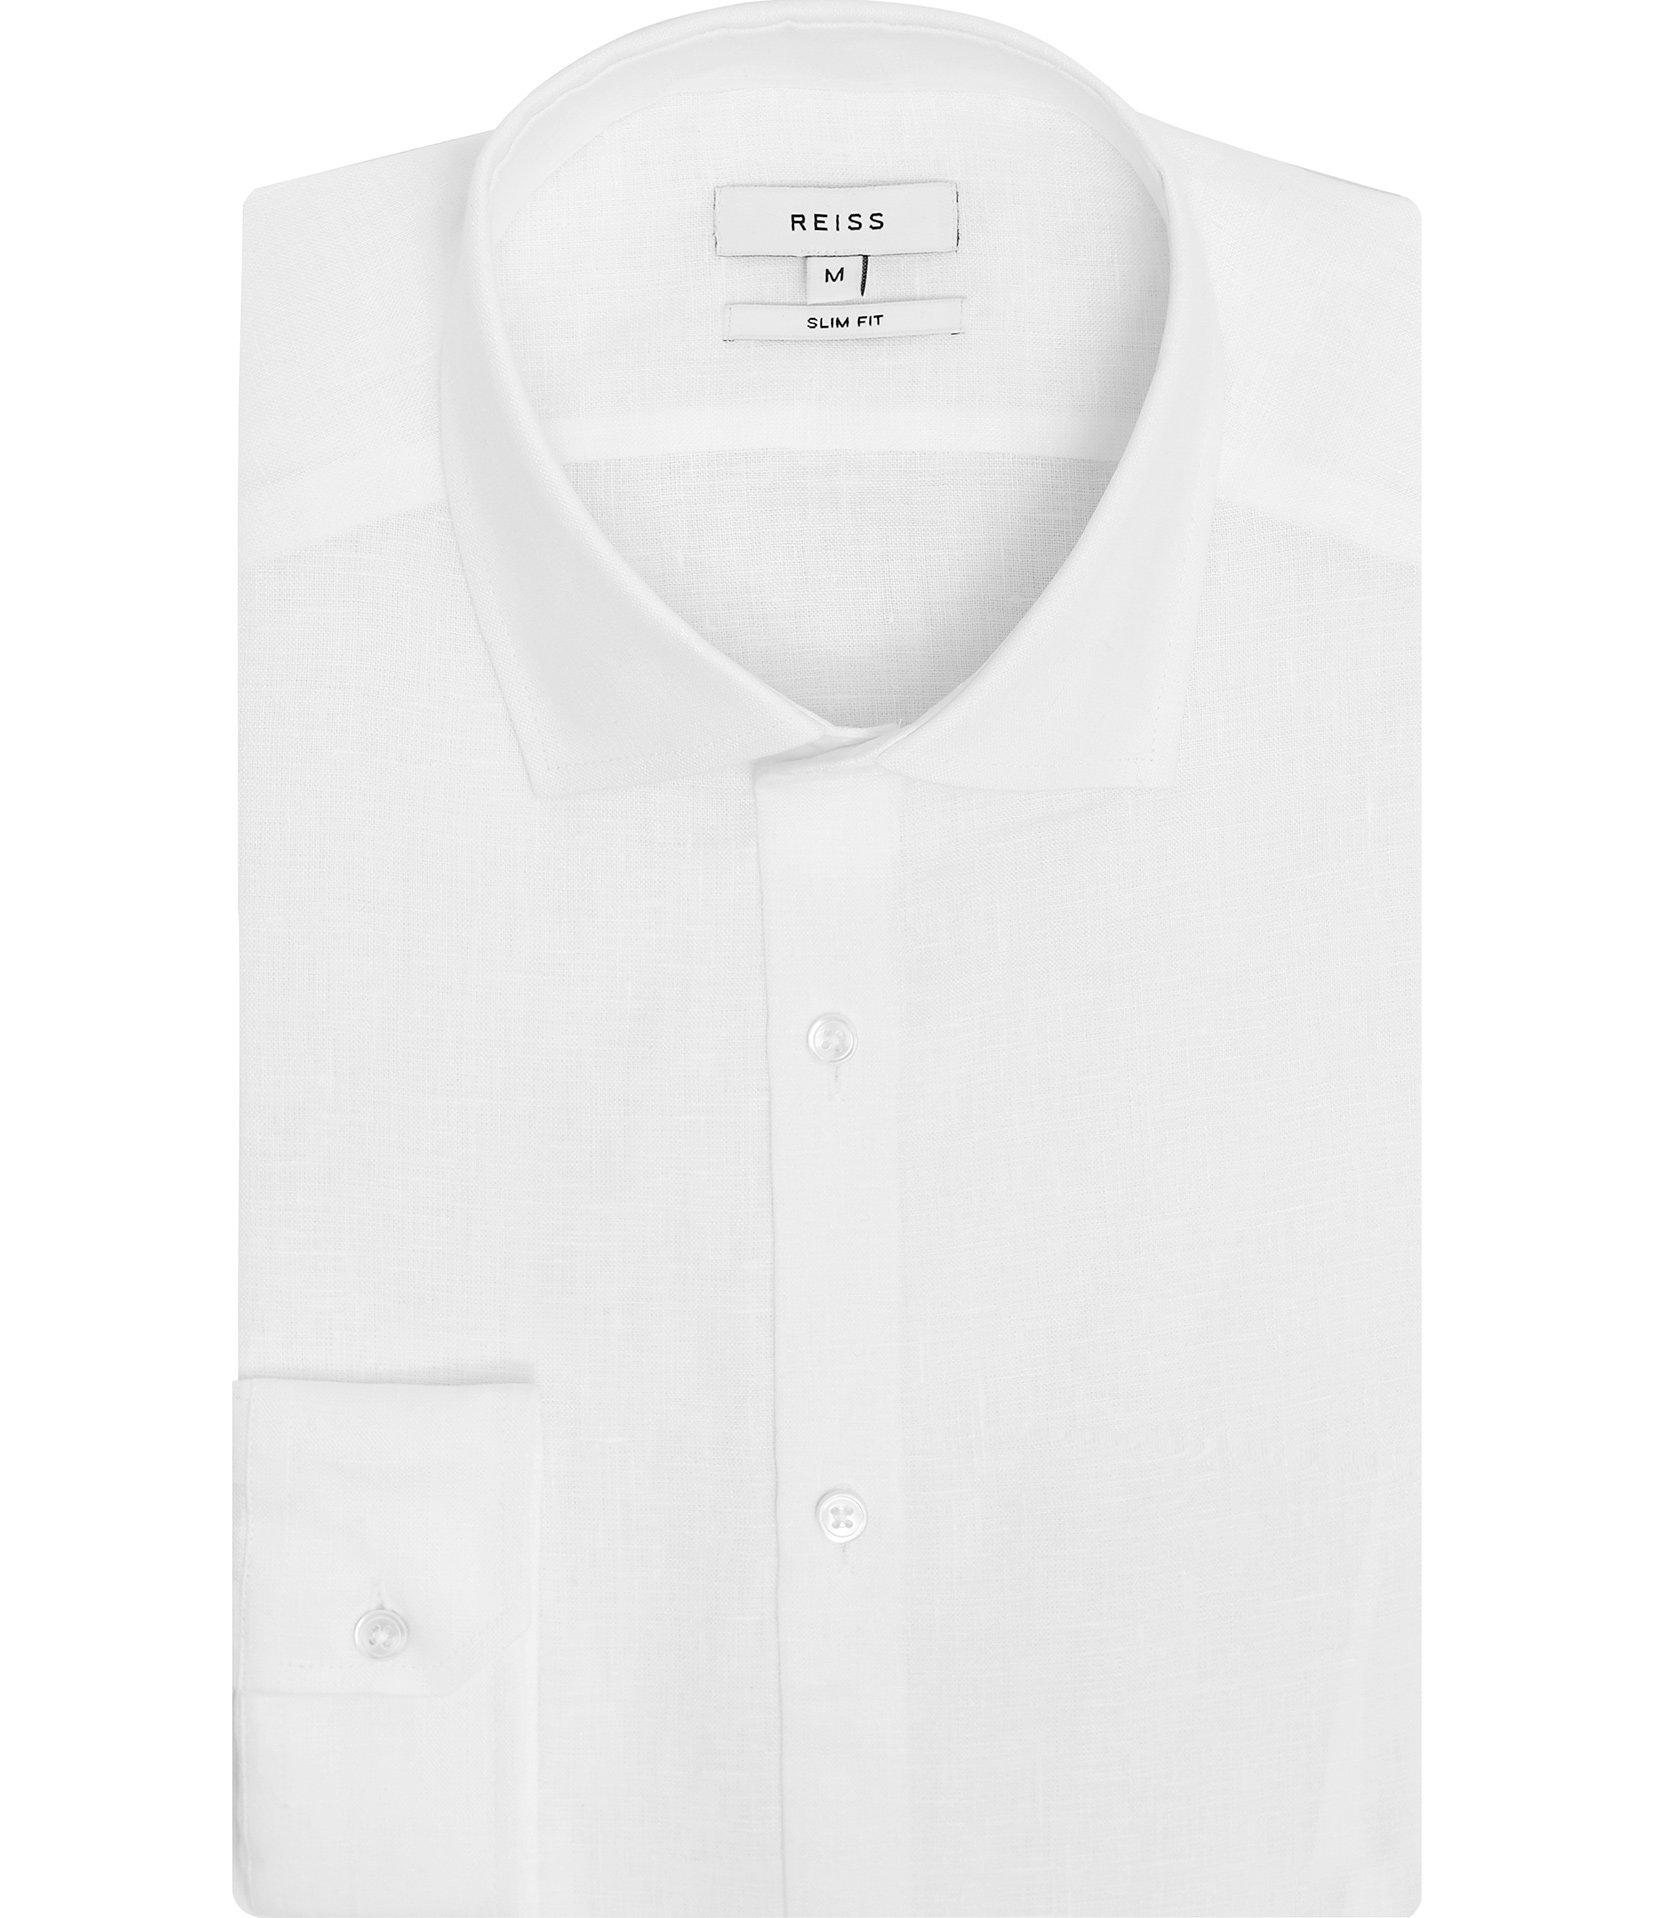 REISS White Linen Shirt